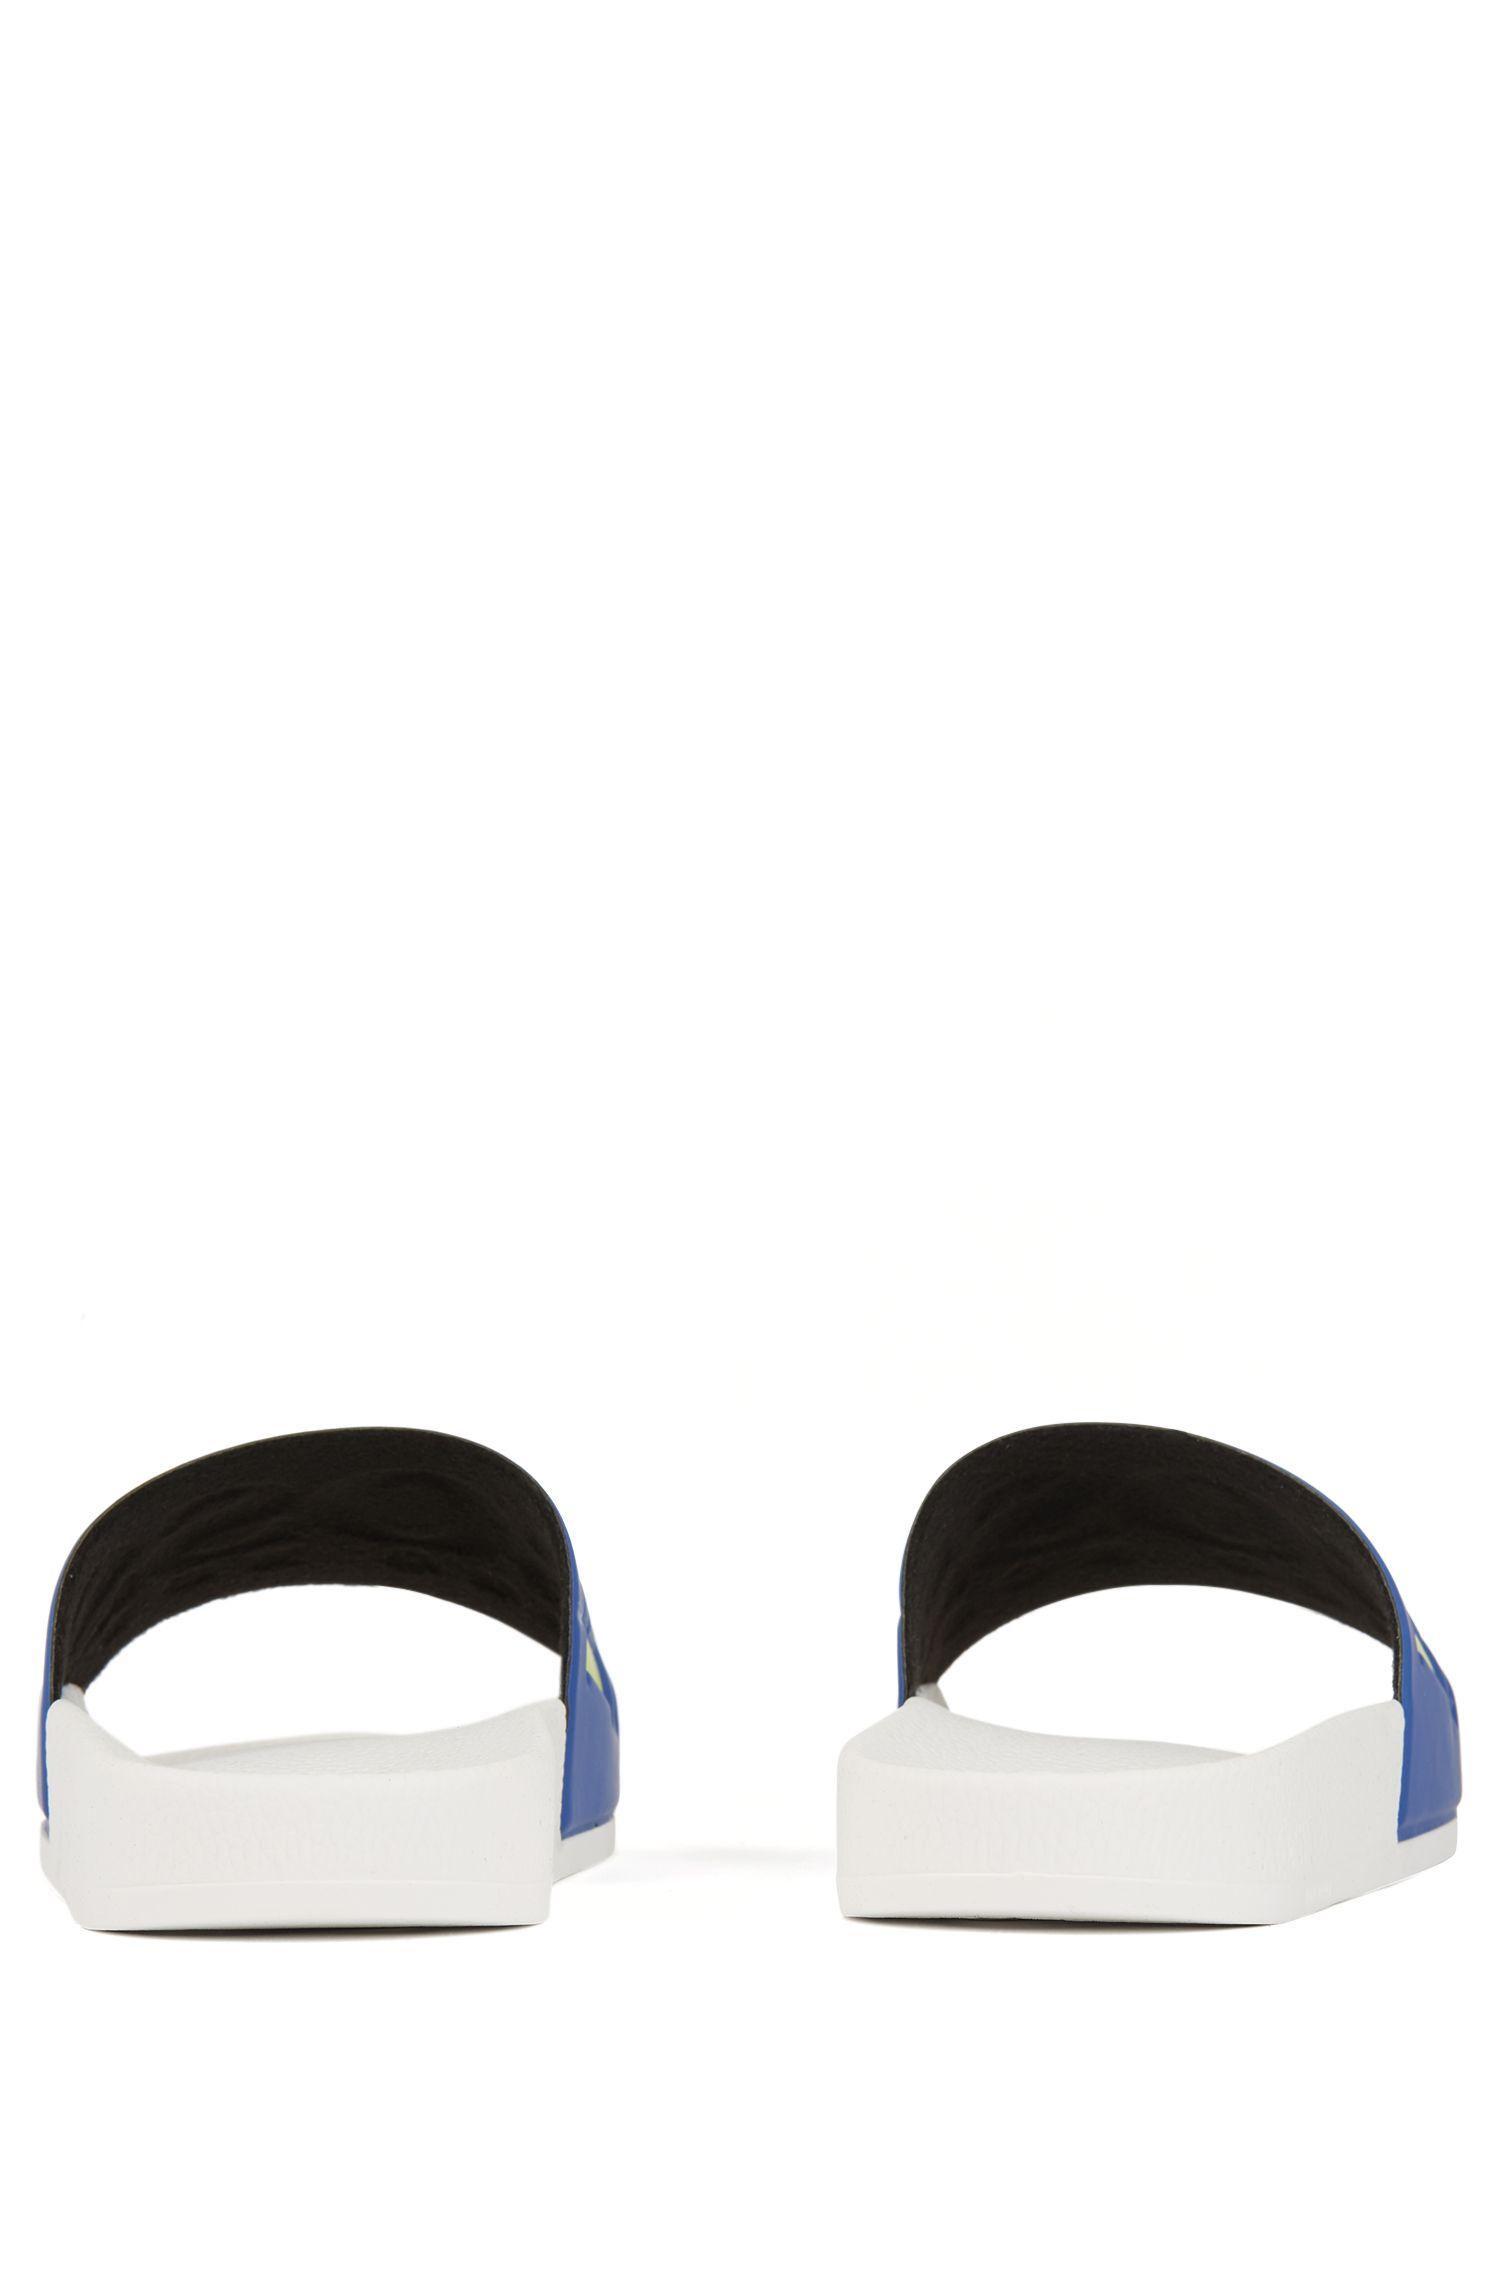 Hugo Boss - Italian-made rubber slide sandals with contrast logo - 5